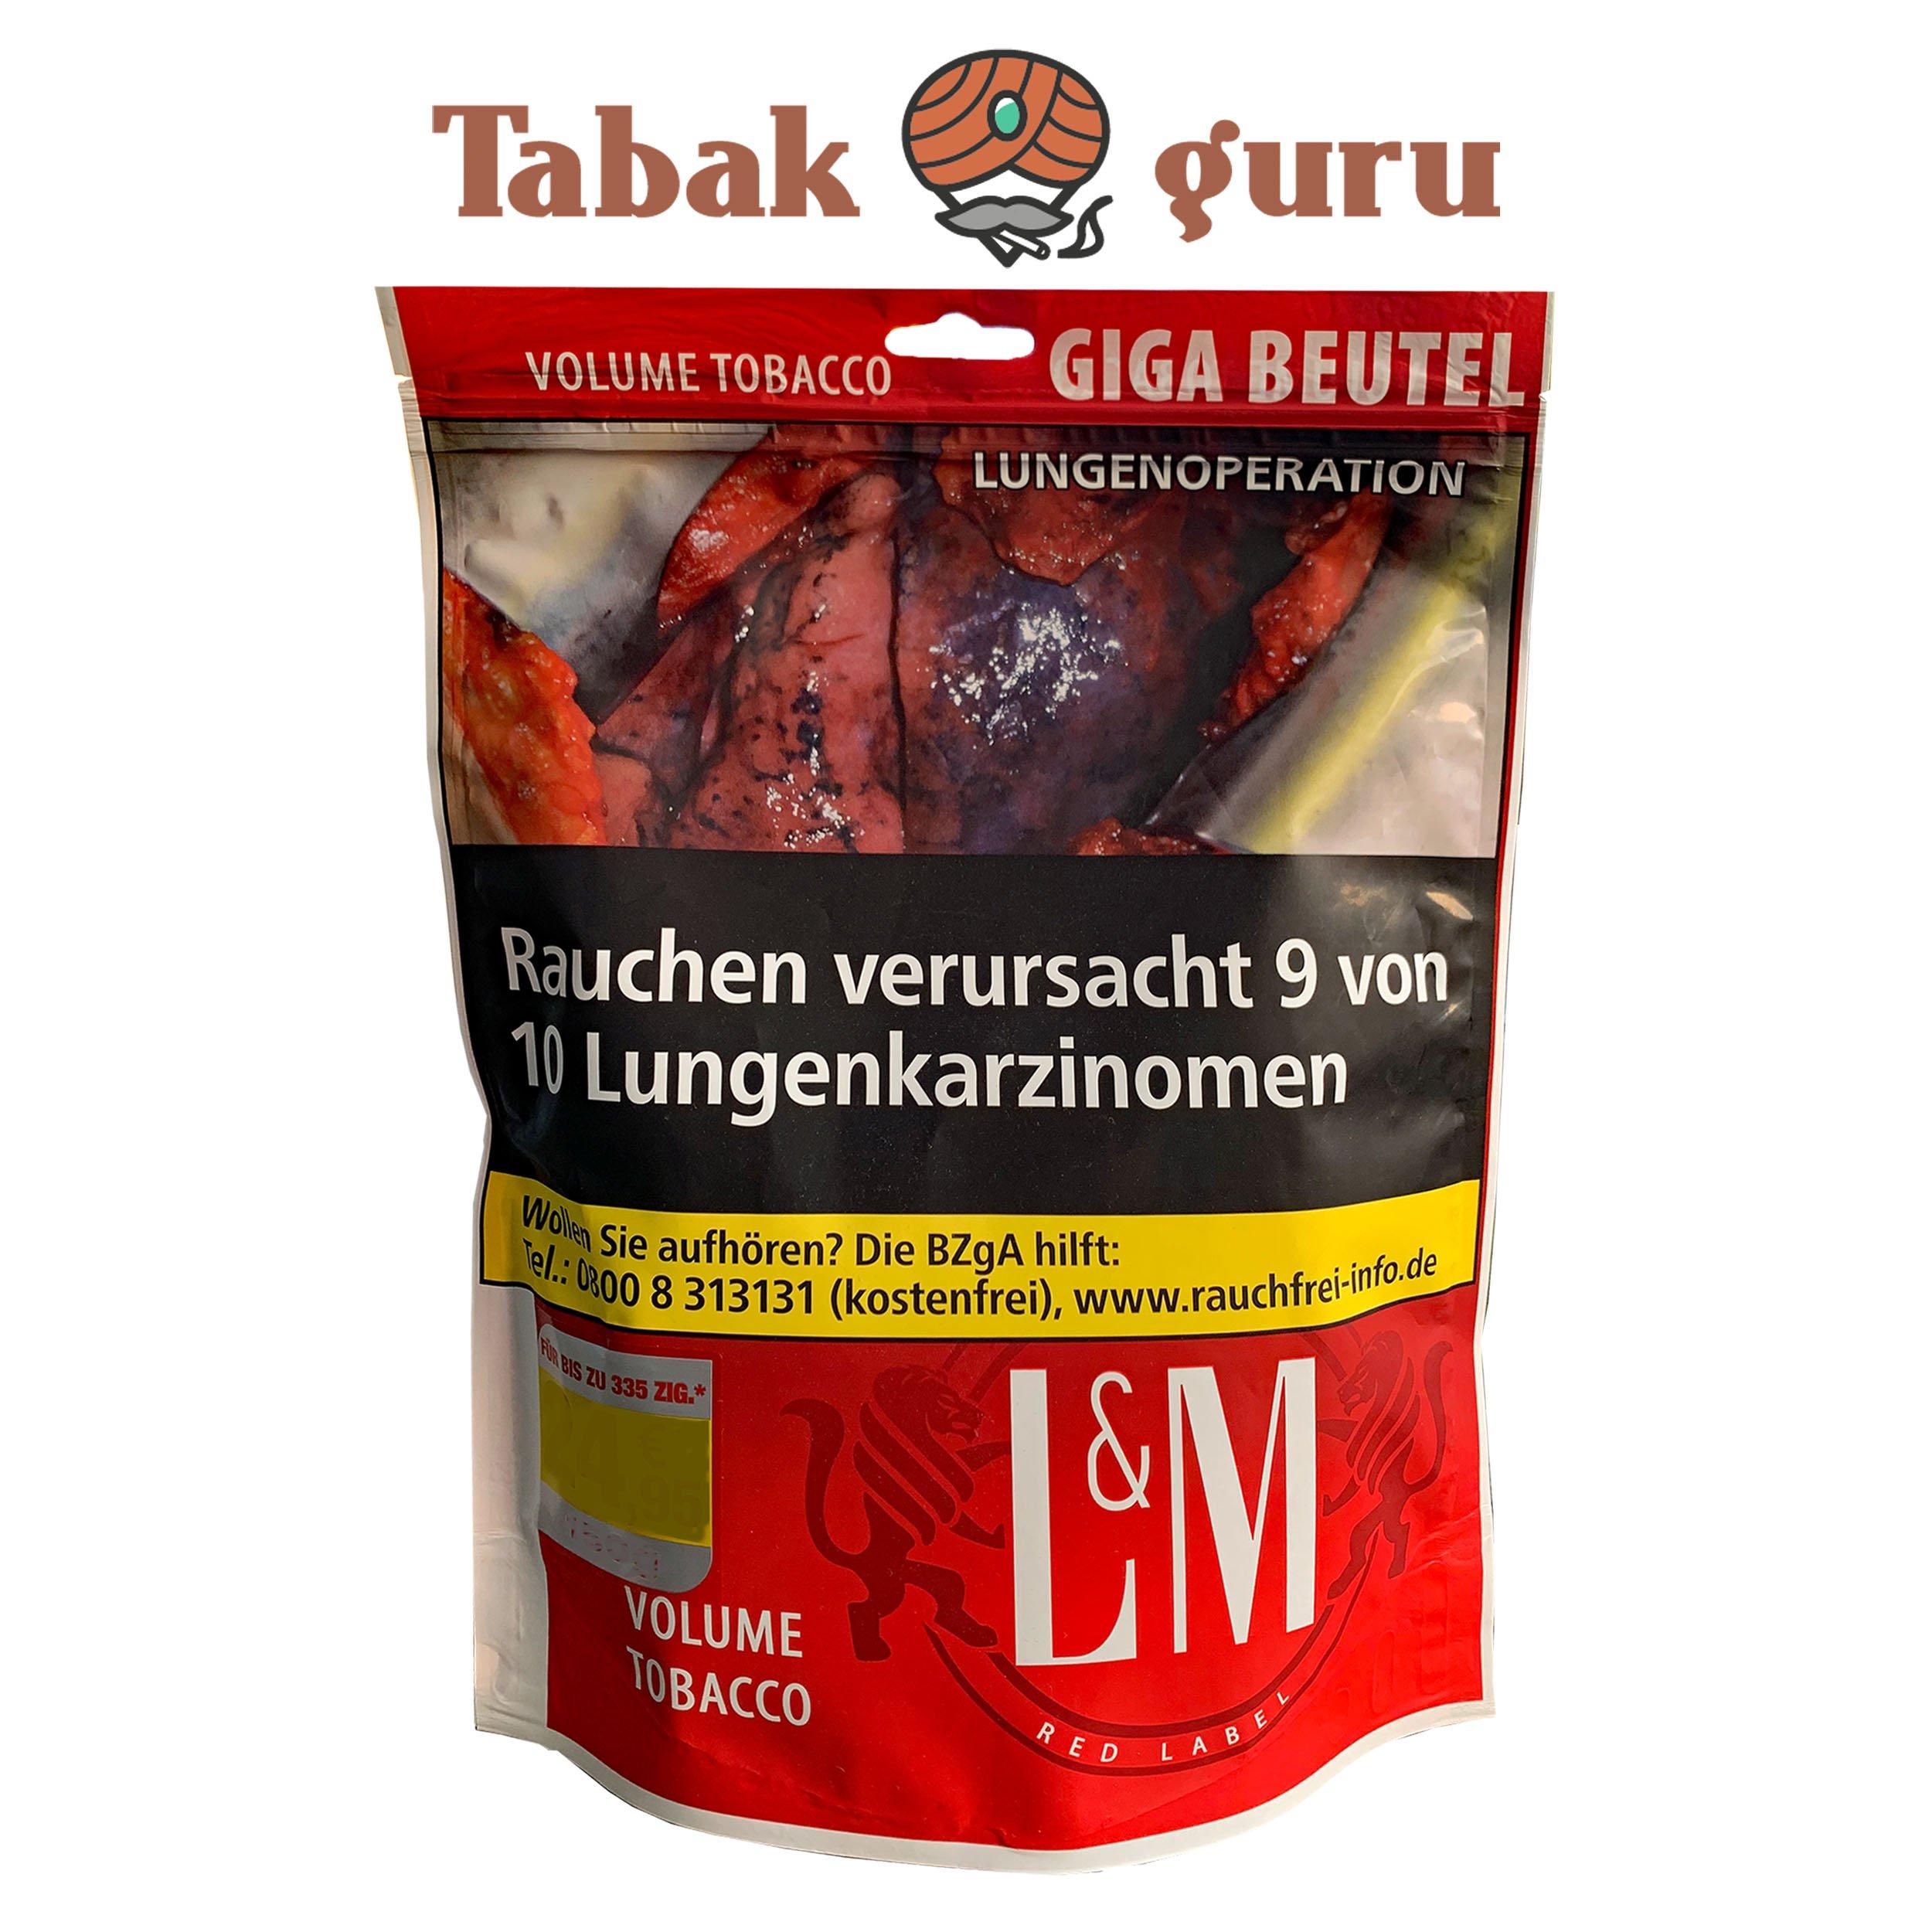 LM Red Label Giga Beutel Volumentabak